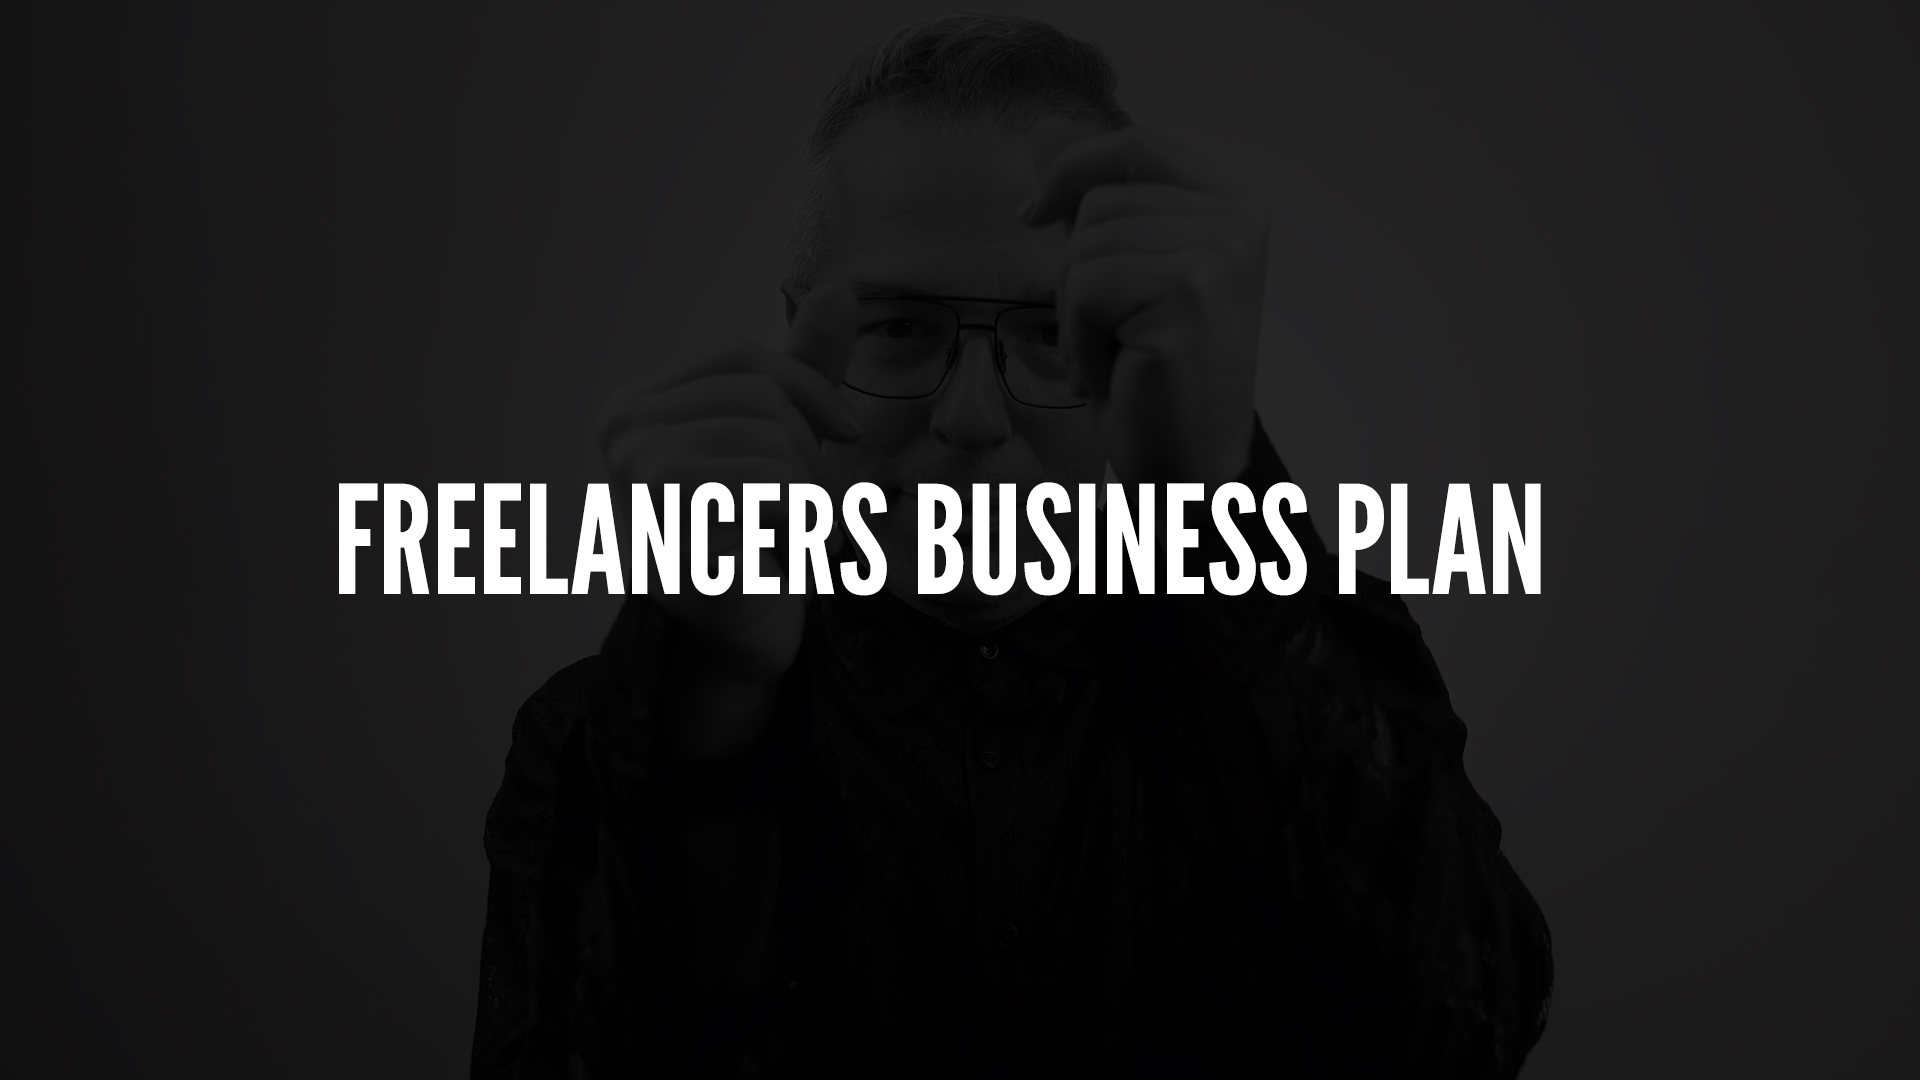 Freelancers Business Plan.jpg